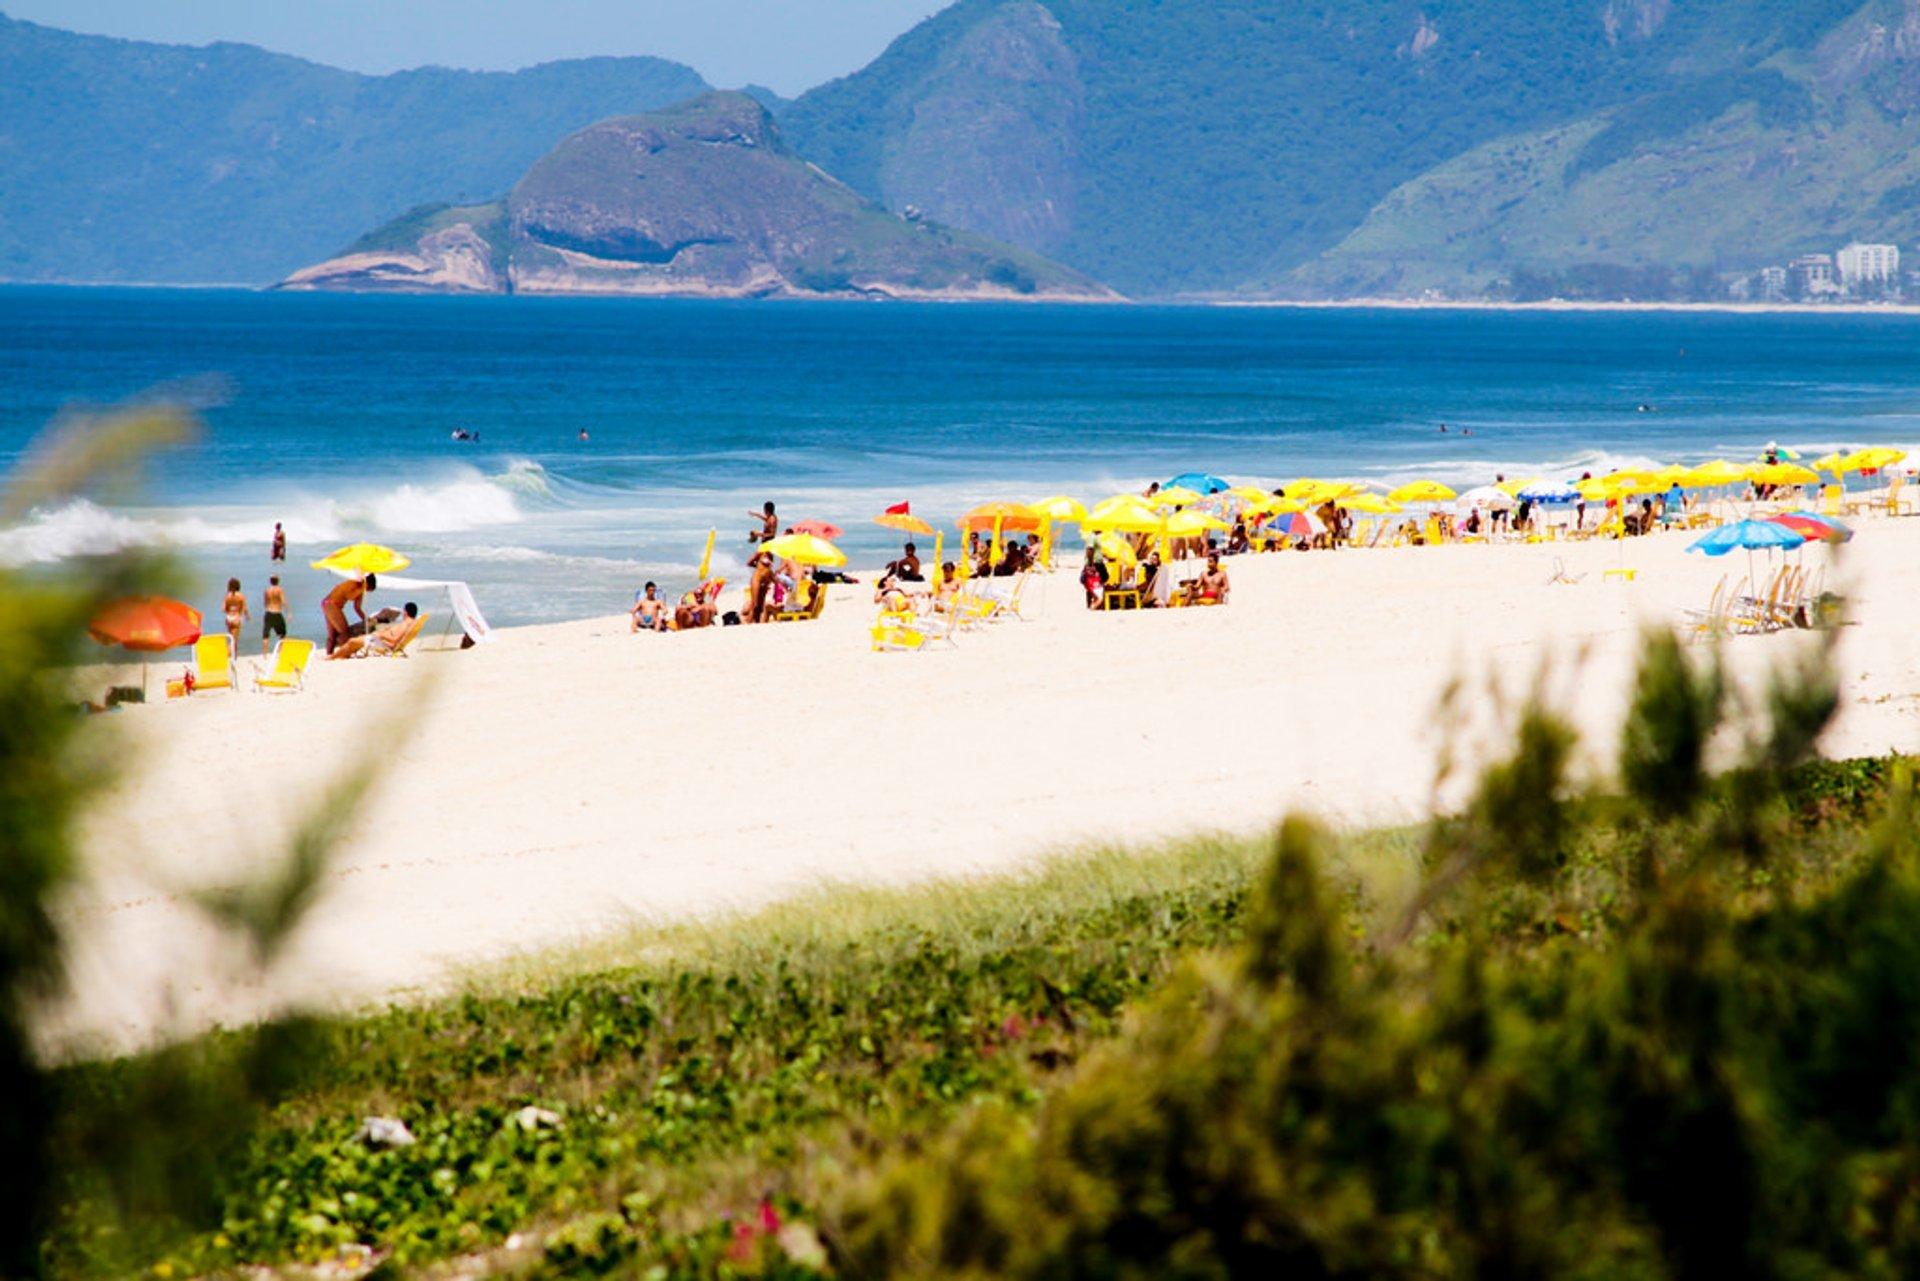 Beach Season in Rio de Janeiro 2020 - Best Time